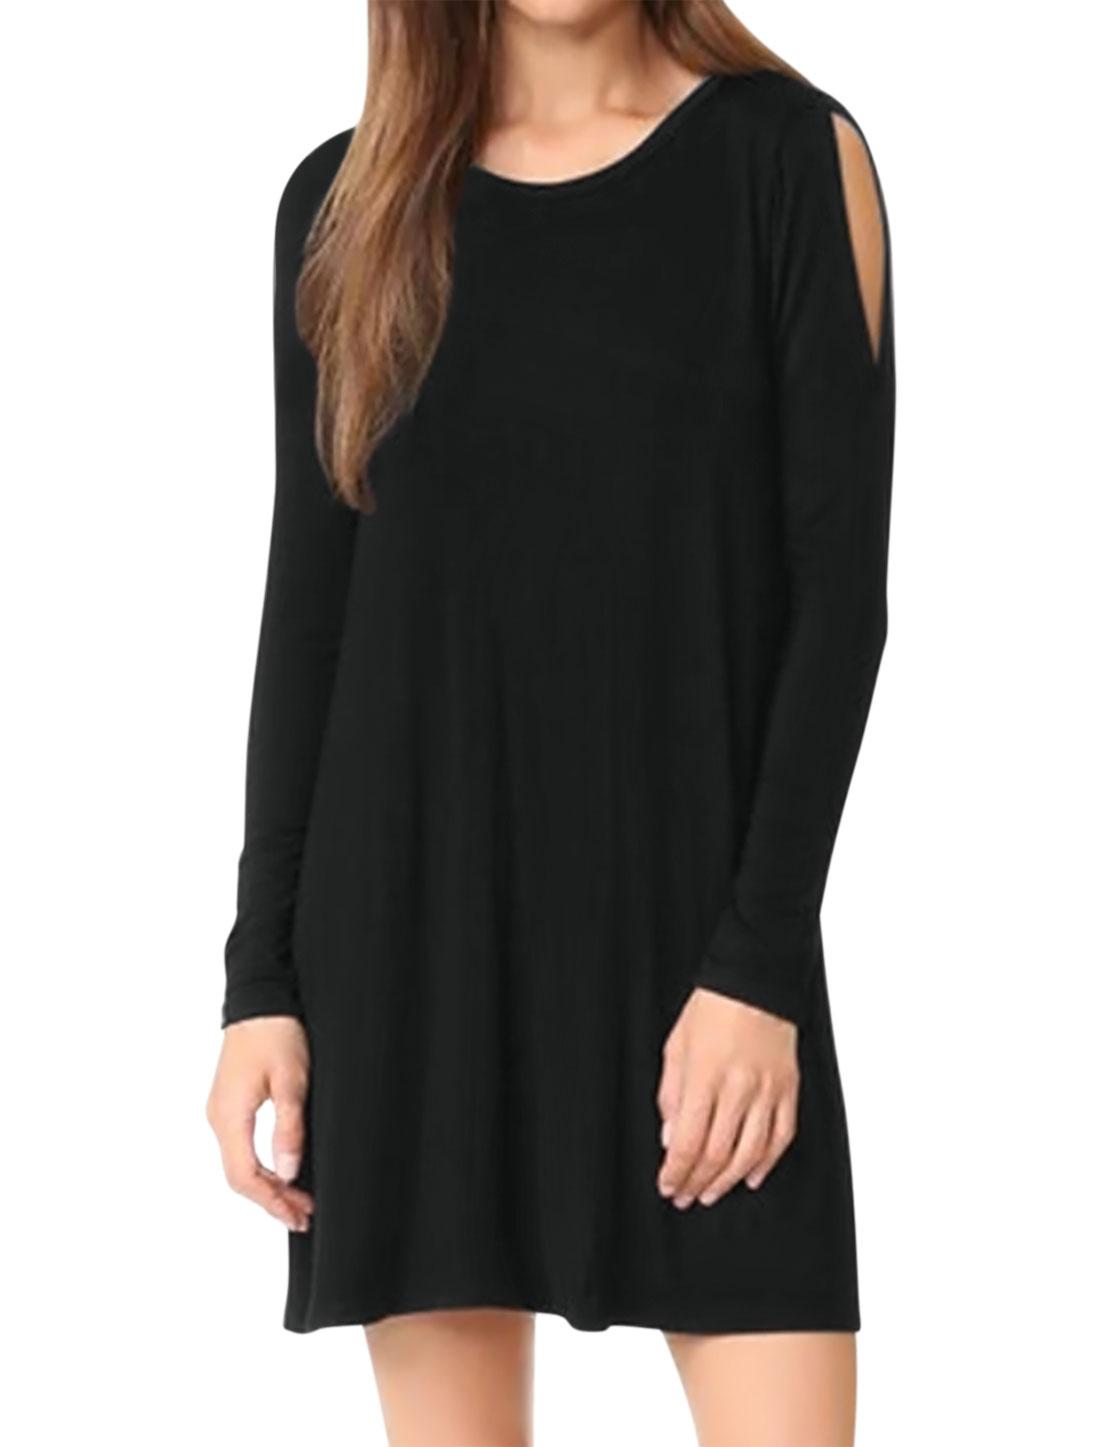 Women Split Shoulder Long Sleeves A Line Loose Tunic Dress Black S